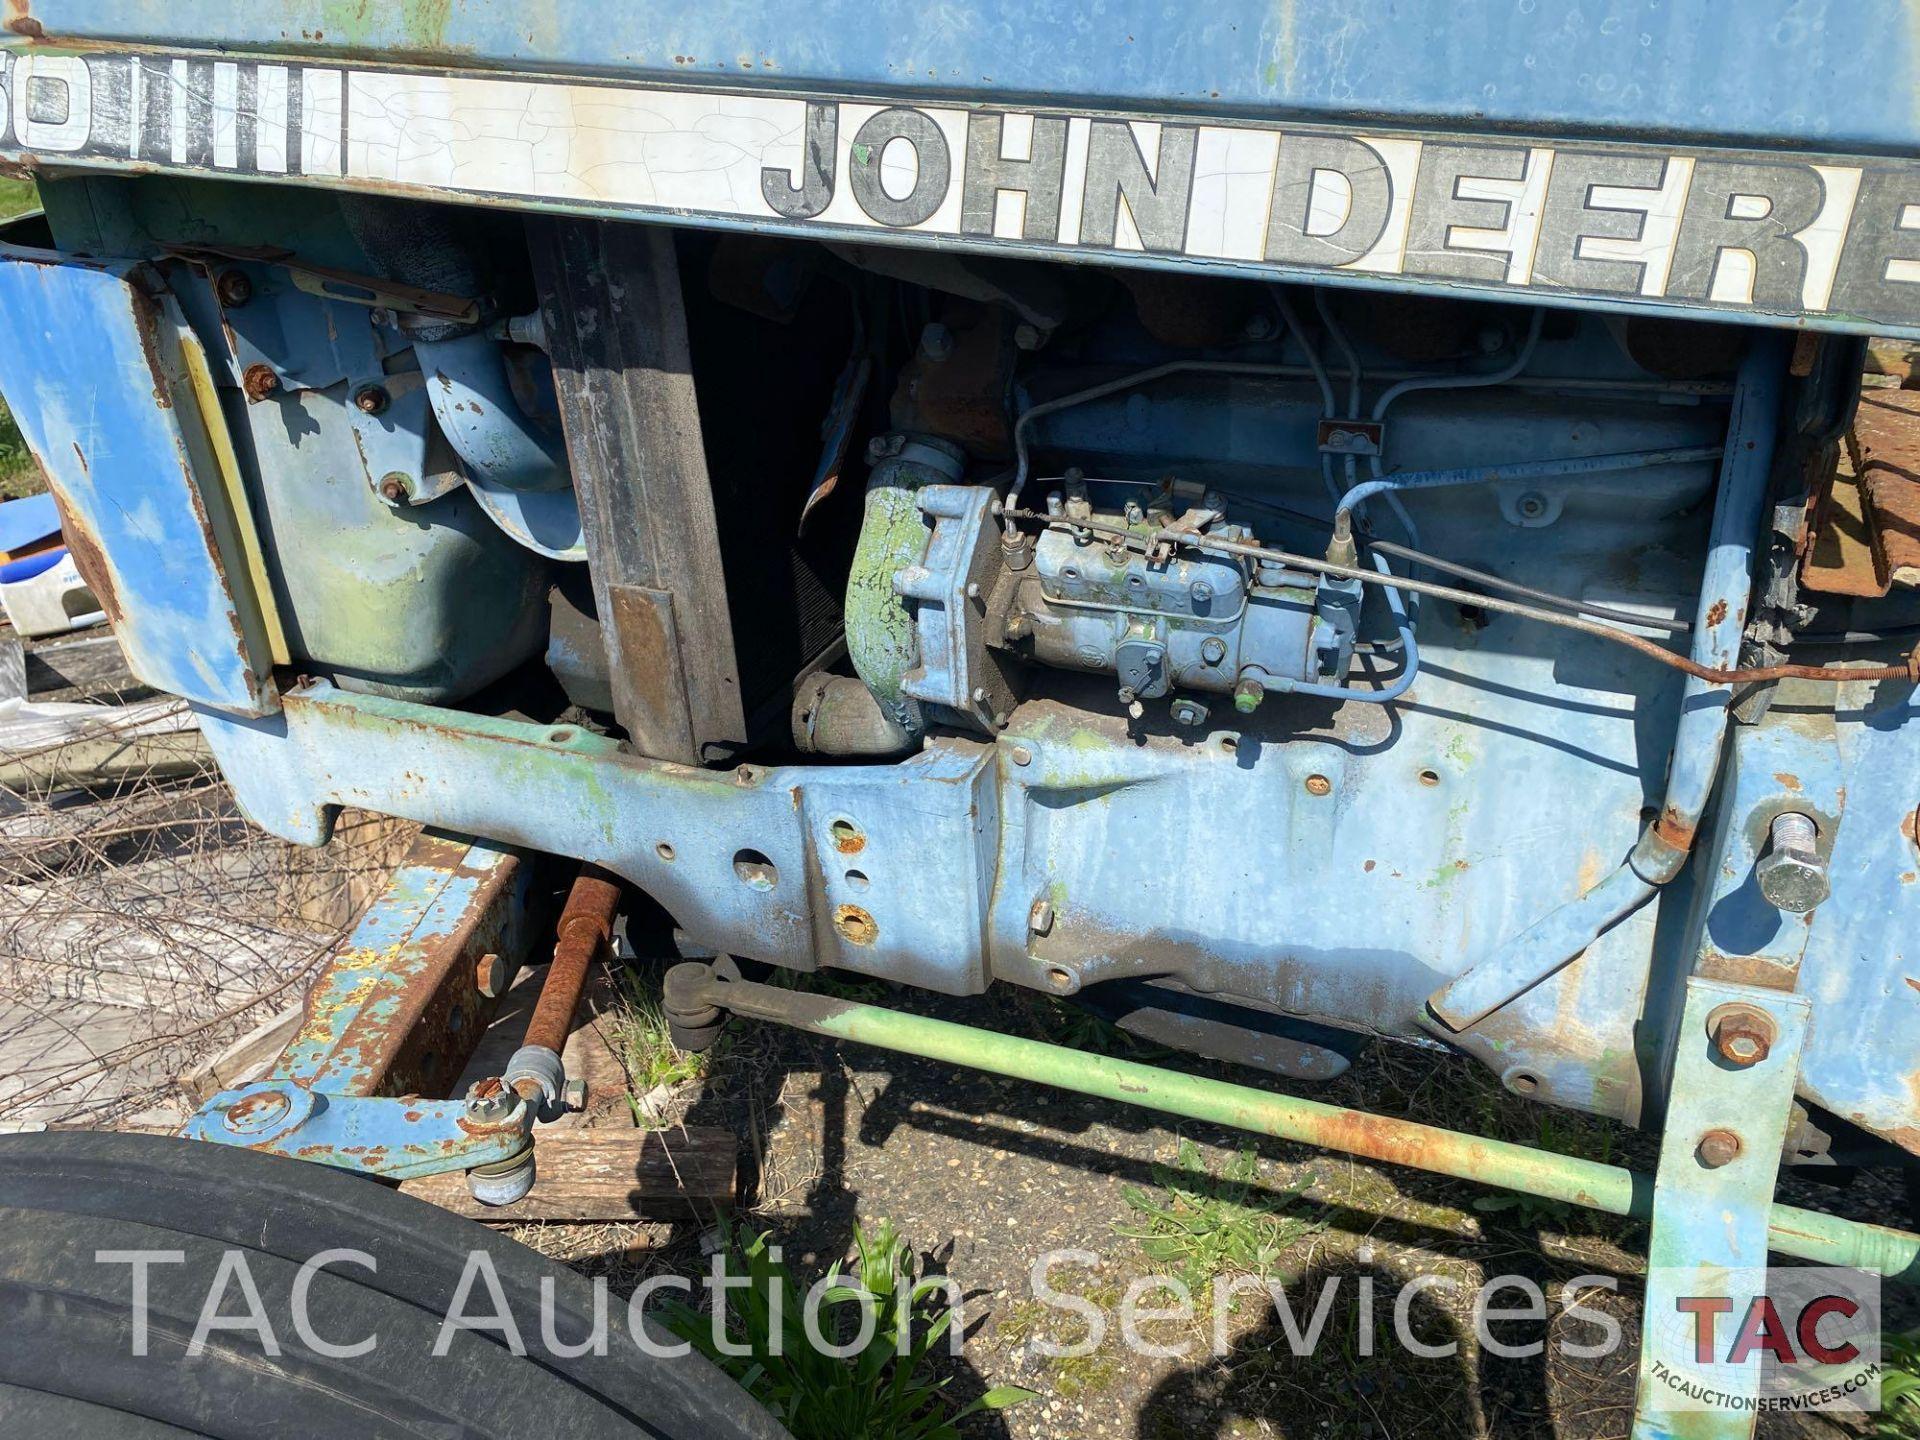 John Deere 2150 Farm Tractor - Image 12 of 34